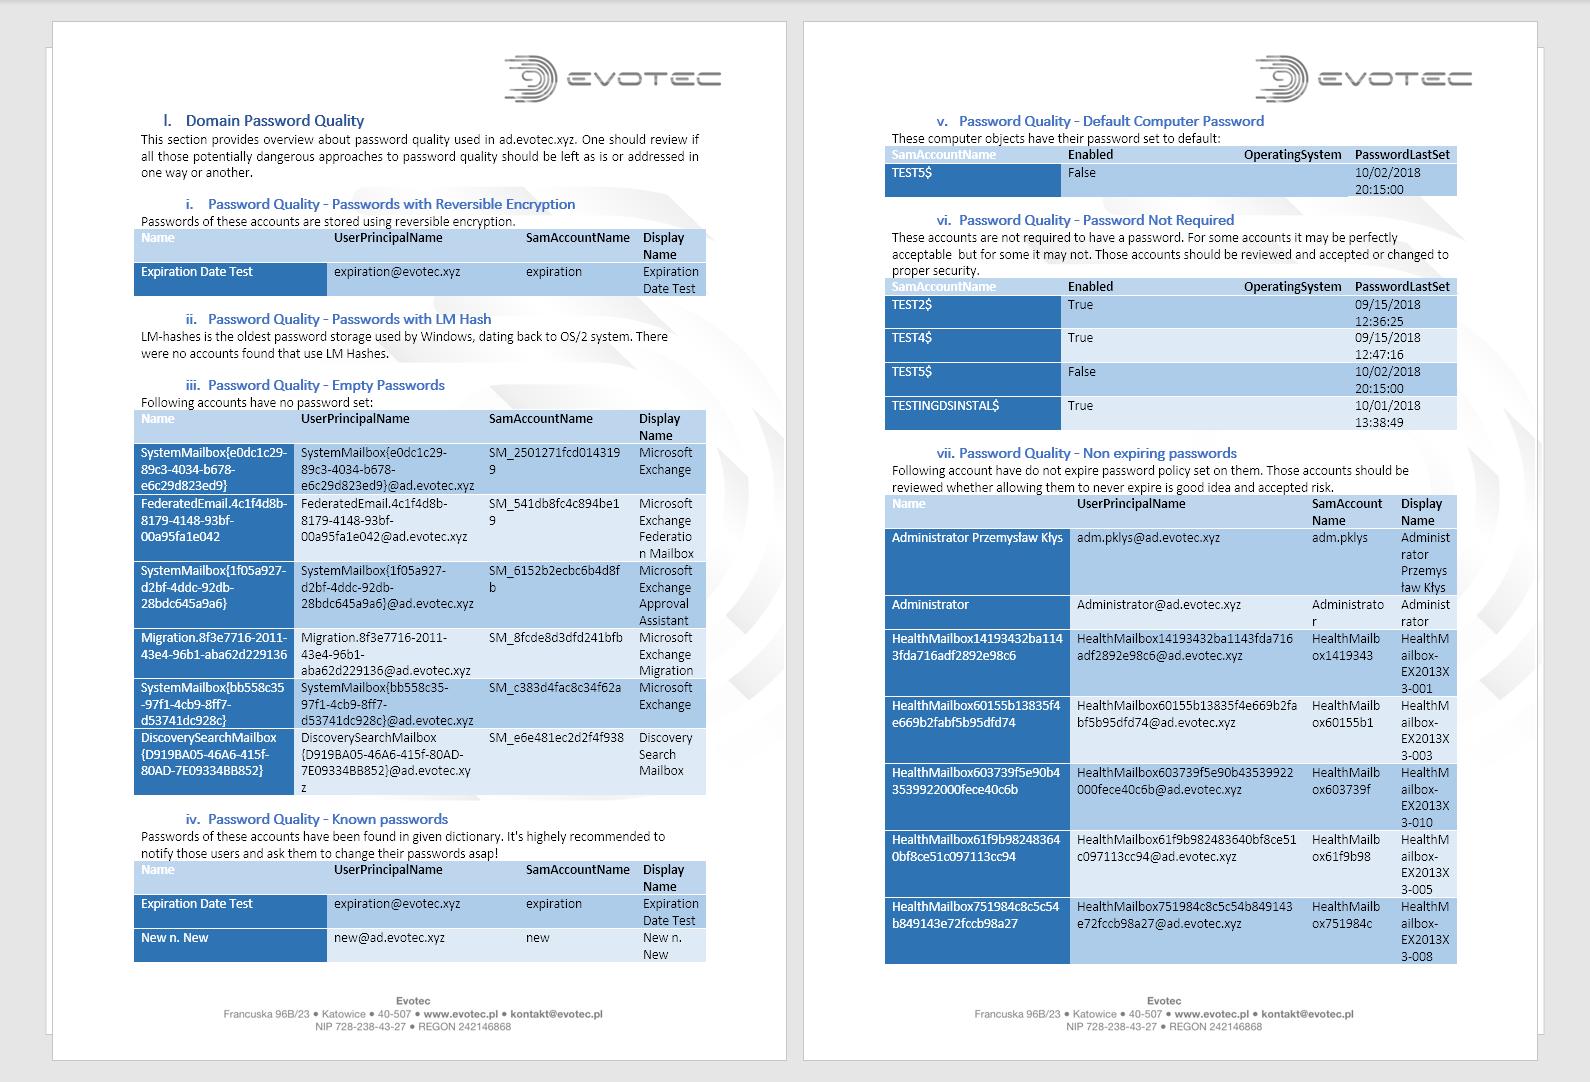 PSWinDocumentation - Audit Active Directory Passwords - Evotec